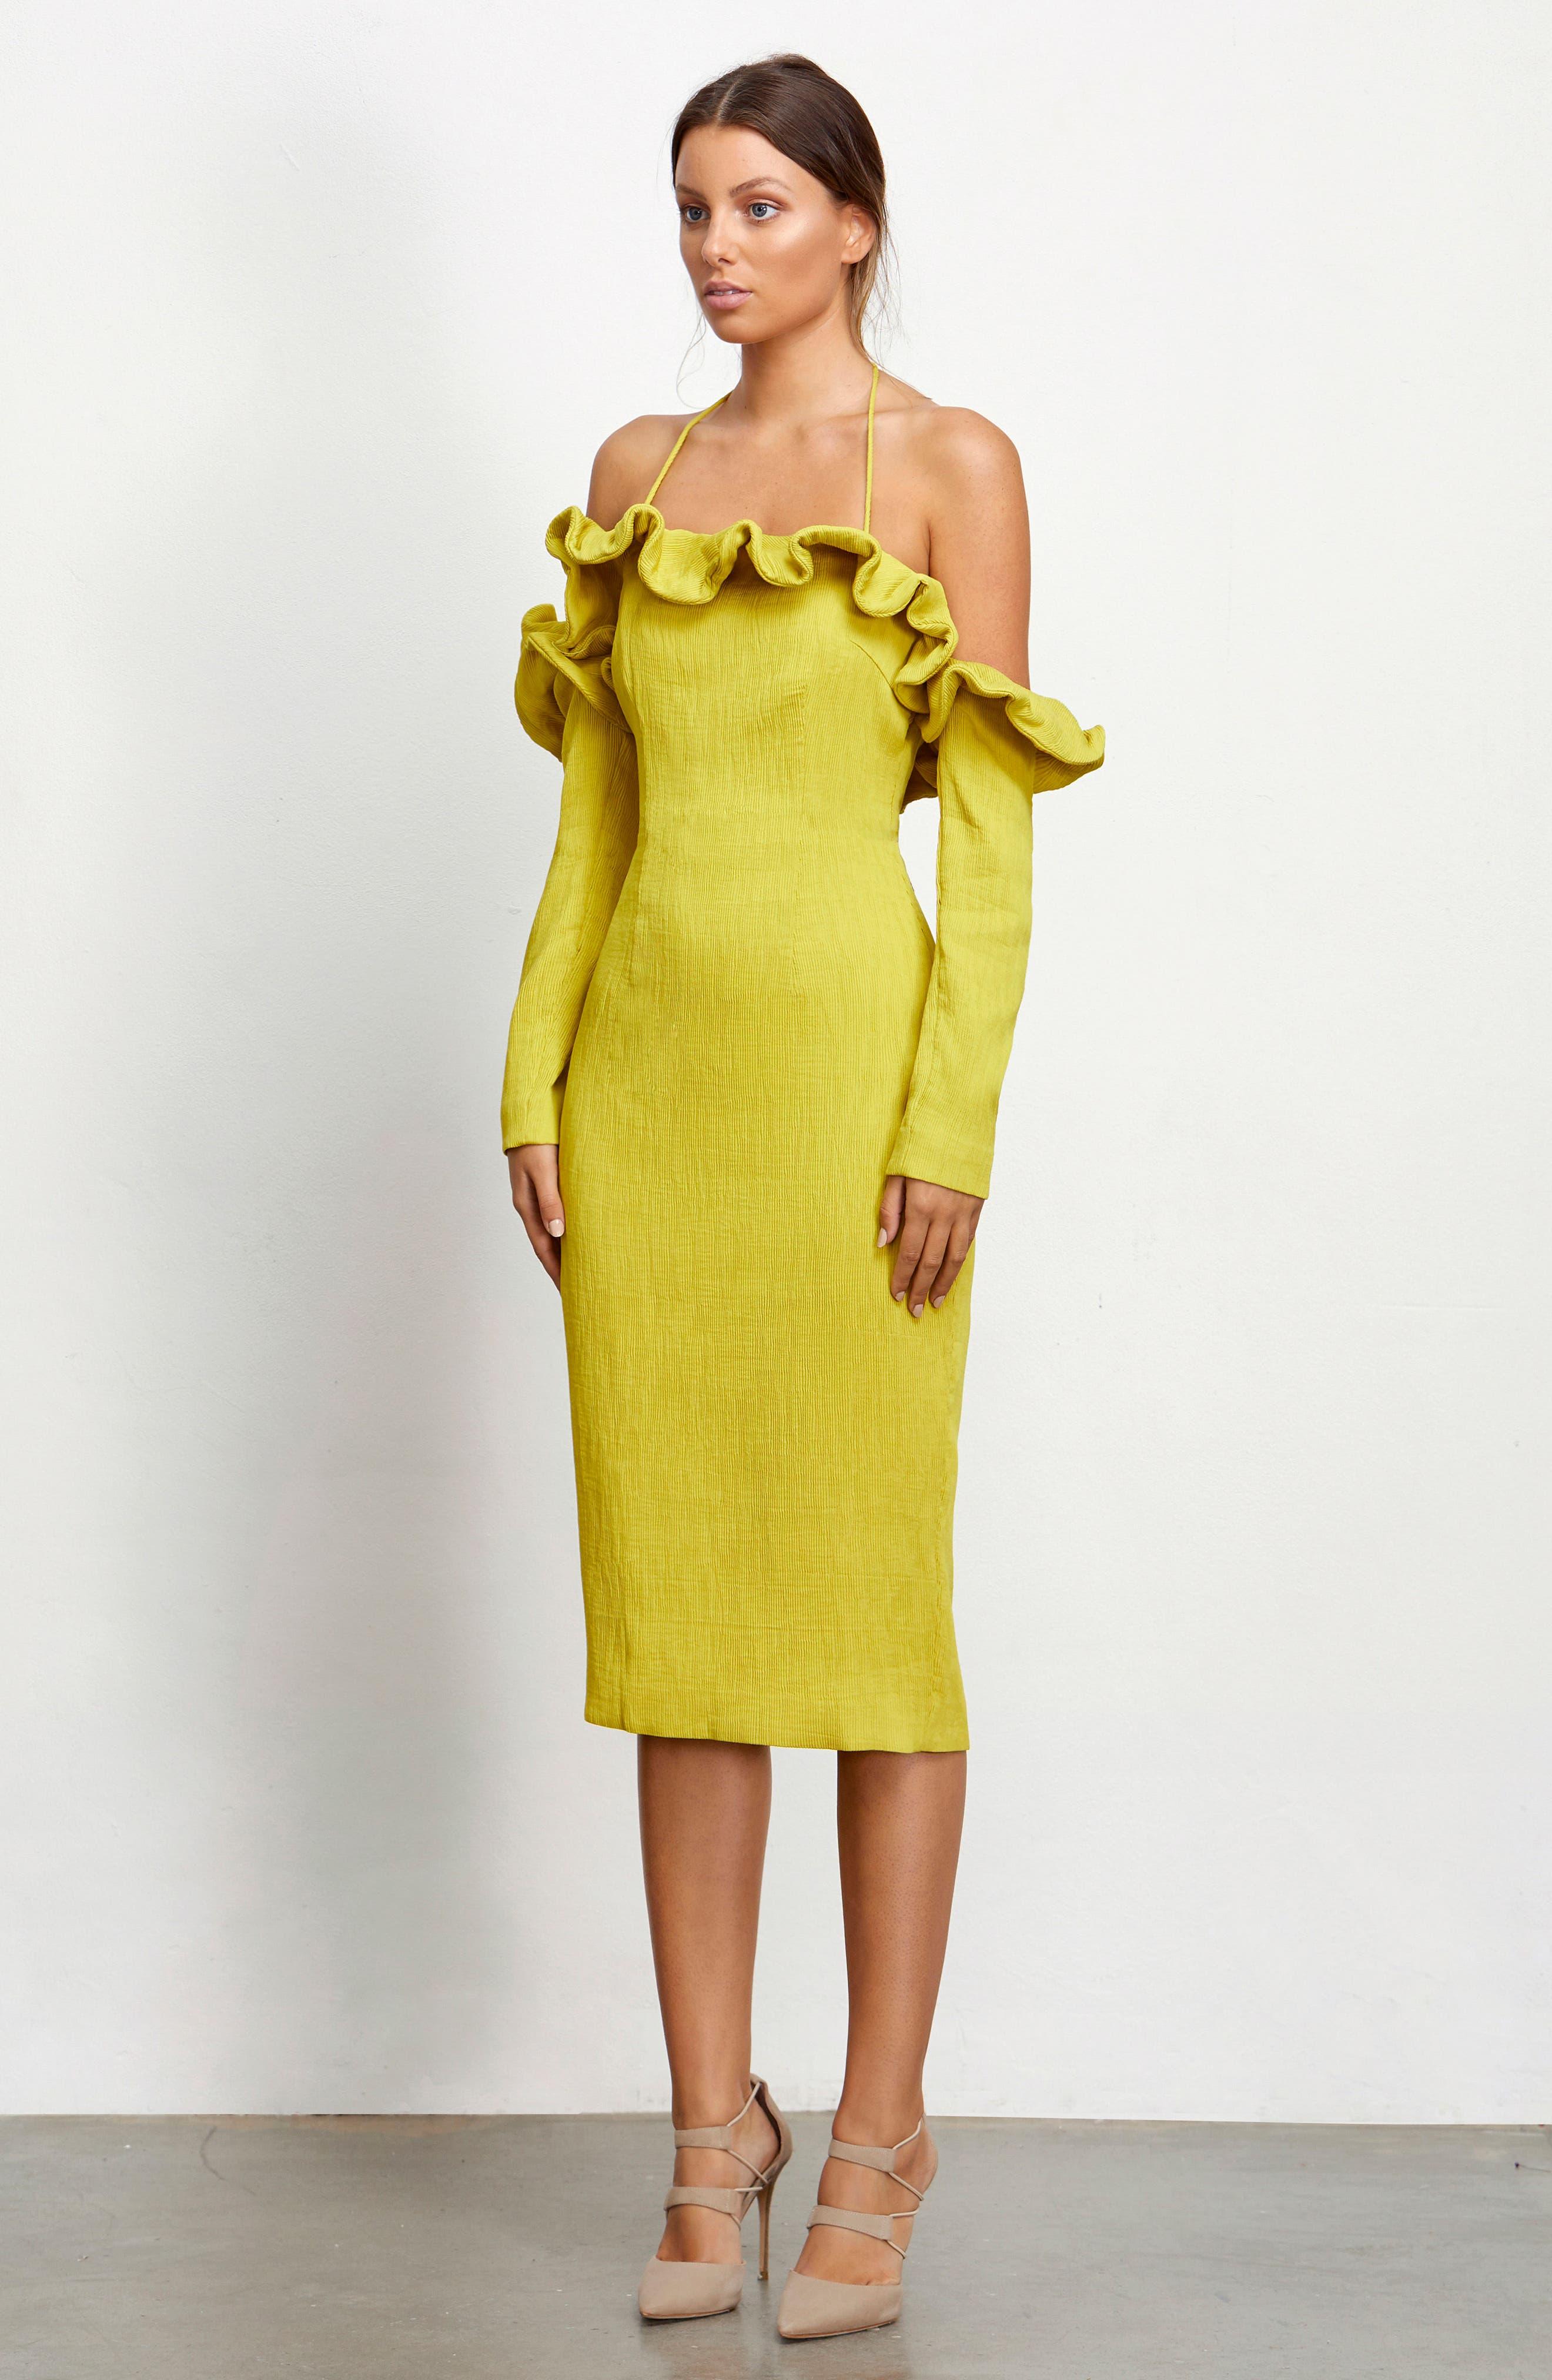 Avon Cold Shoulder Dress,                             Alternate thumbnail 8, color,                             Chartreuse